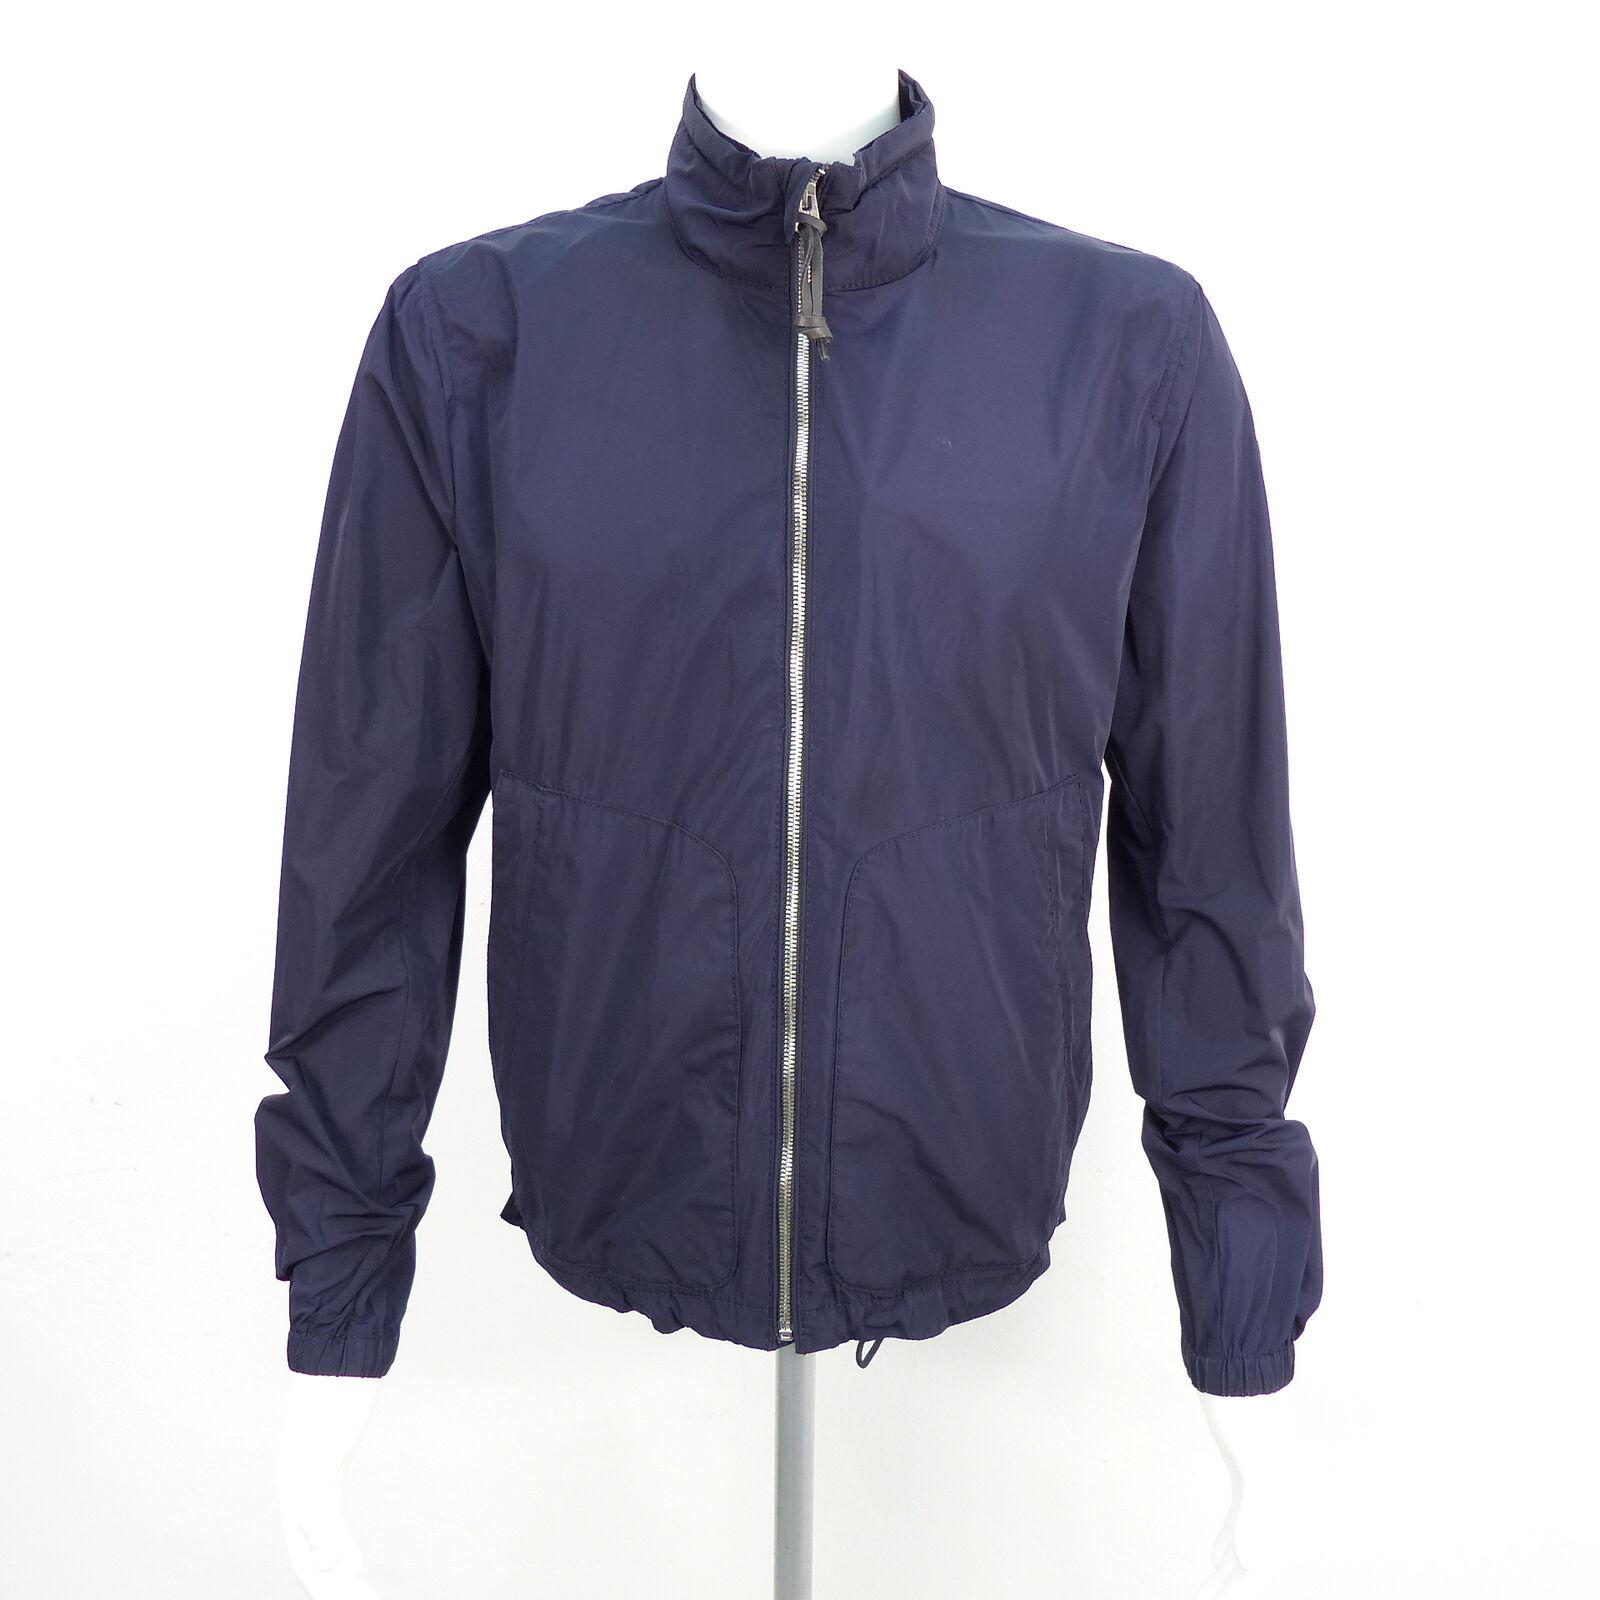 MARC O´POLO Herren Jacke blau Gr. M Oberteil Jackets Coats